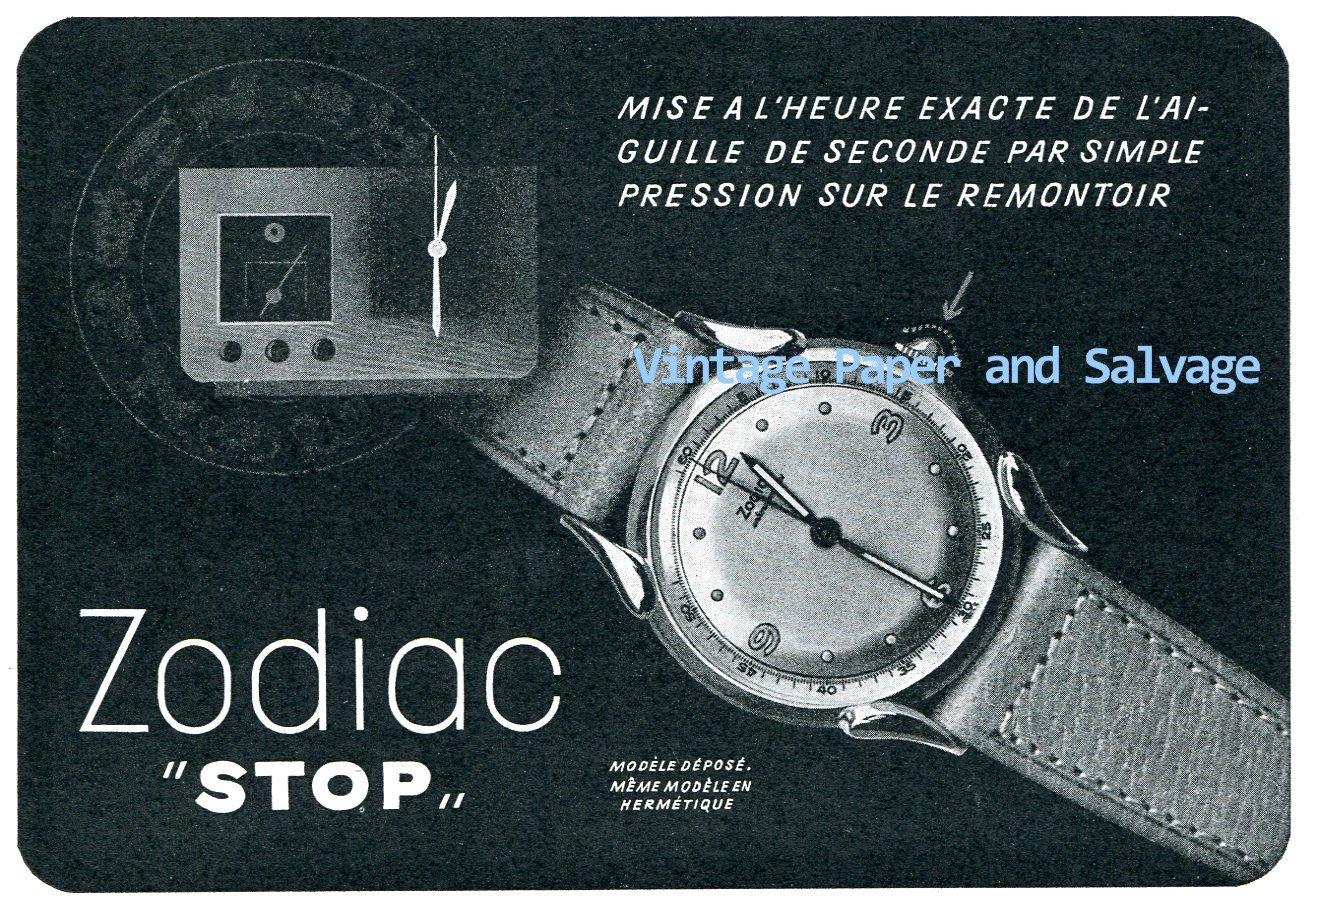 "Vintage 1945 Zodiac ""Stop"" Watch Advert 1940s Swiss Print Ad Publicite Suisse Switzerland"